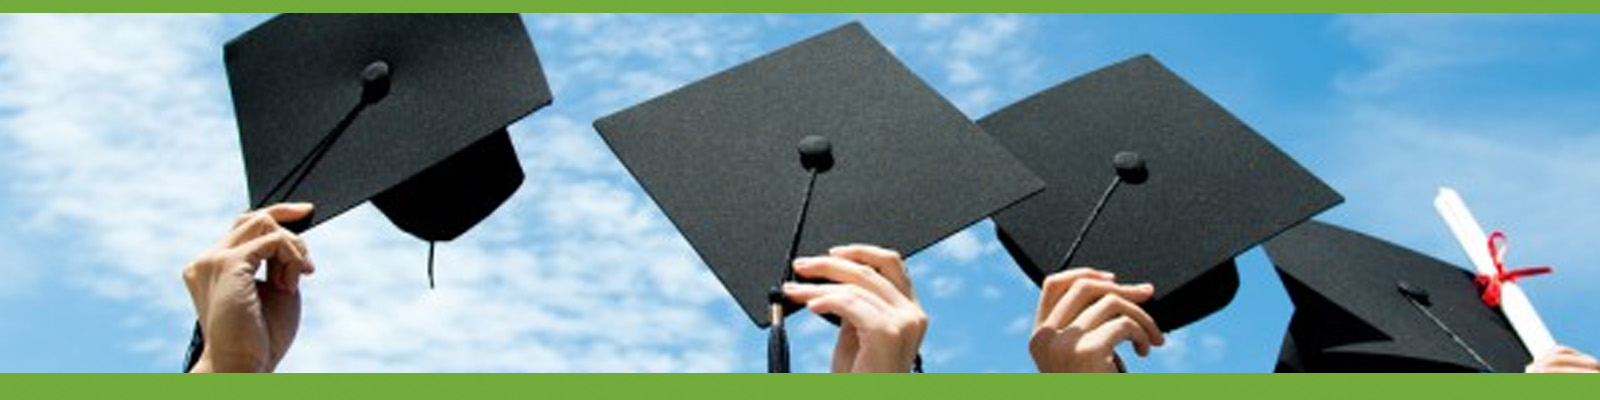 Image_Graduation